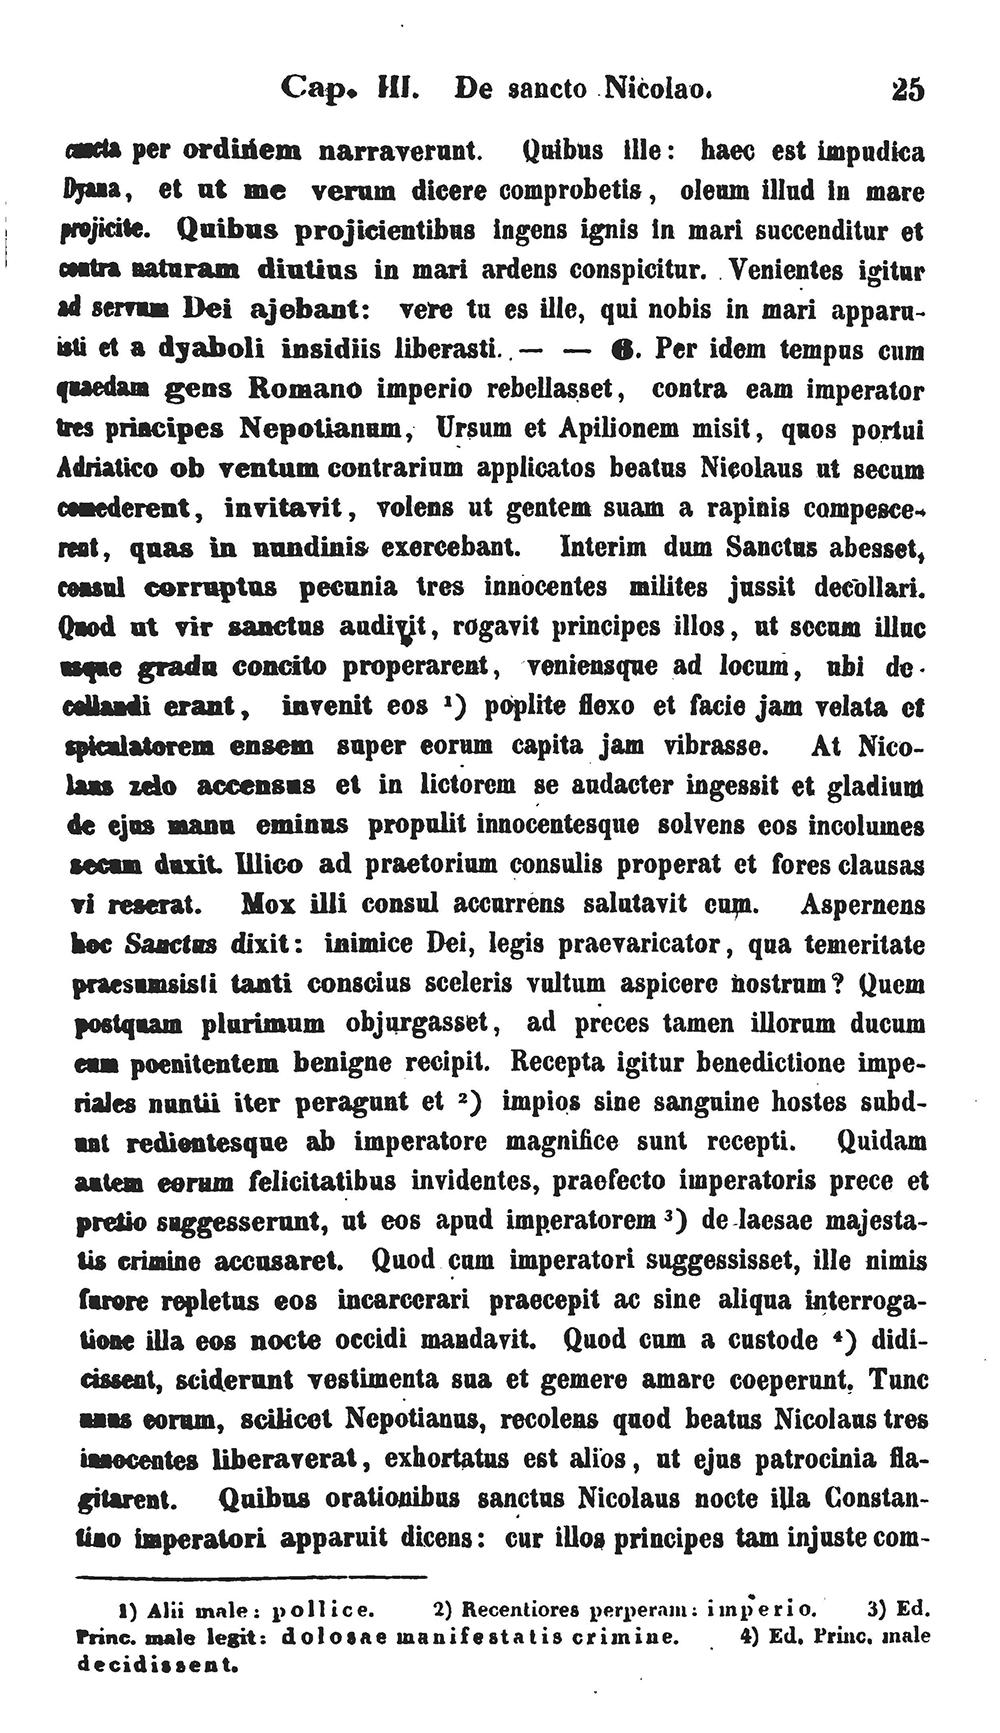 Jacobi a Voragine, Legenda Aurea: Vulgo Historia Lombardica Dicta, a cura di J. G. T. Grasse, Lipsia, Librariae Arnoldianae, 1850